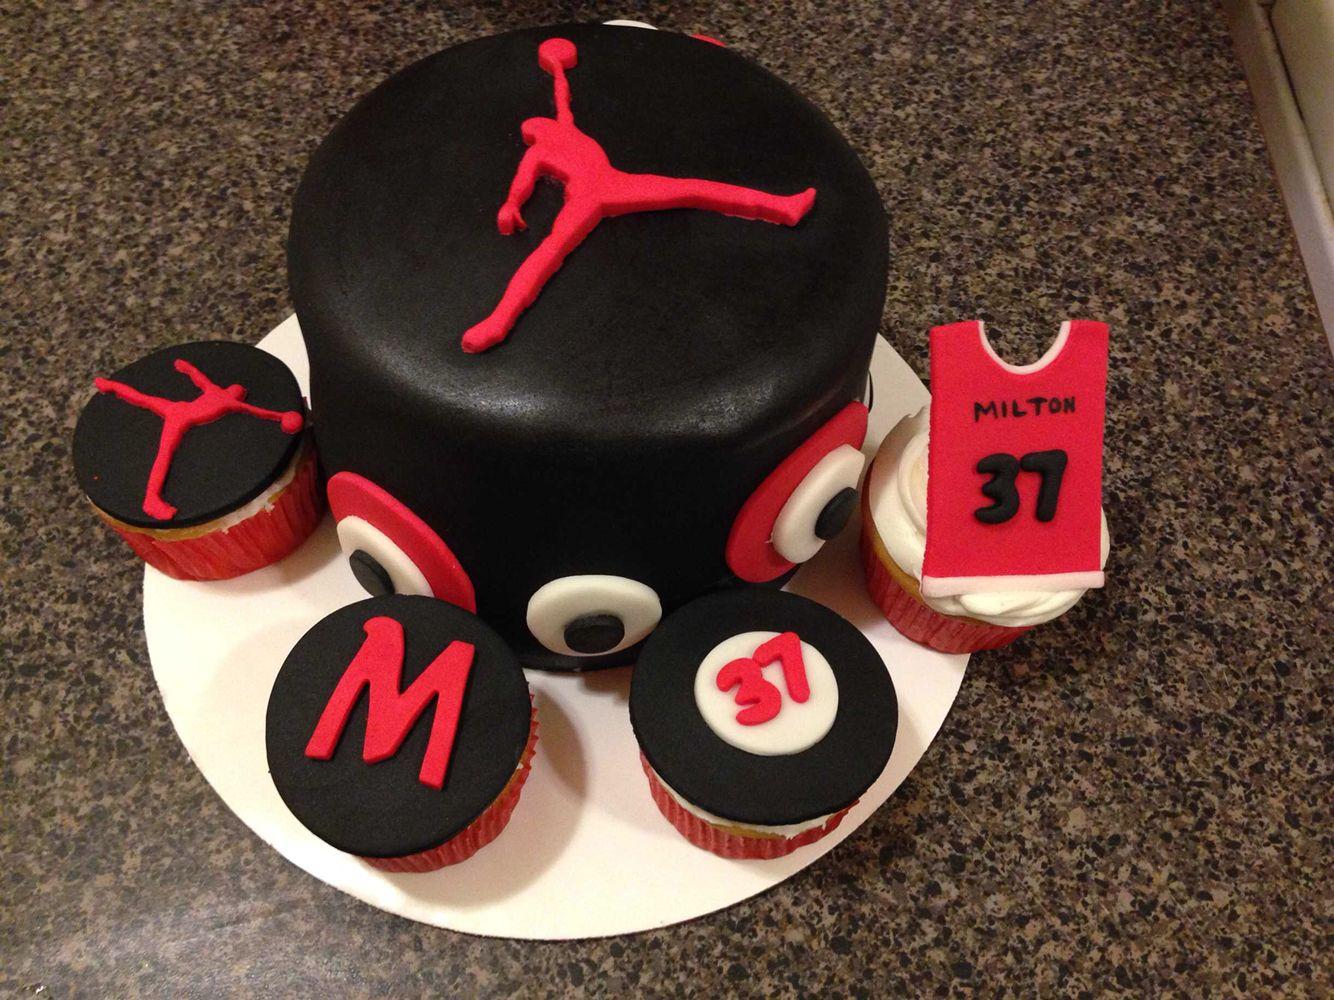 My First Attempt At A Fondant Cake Michael Jordan Themed Jordan